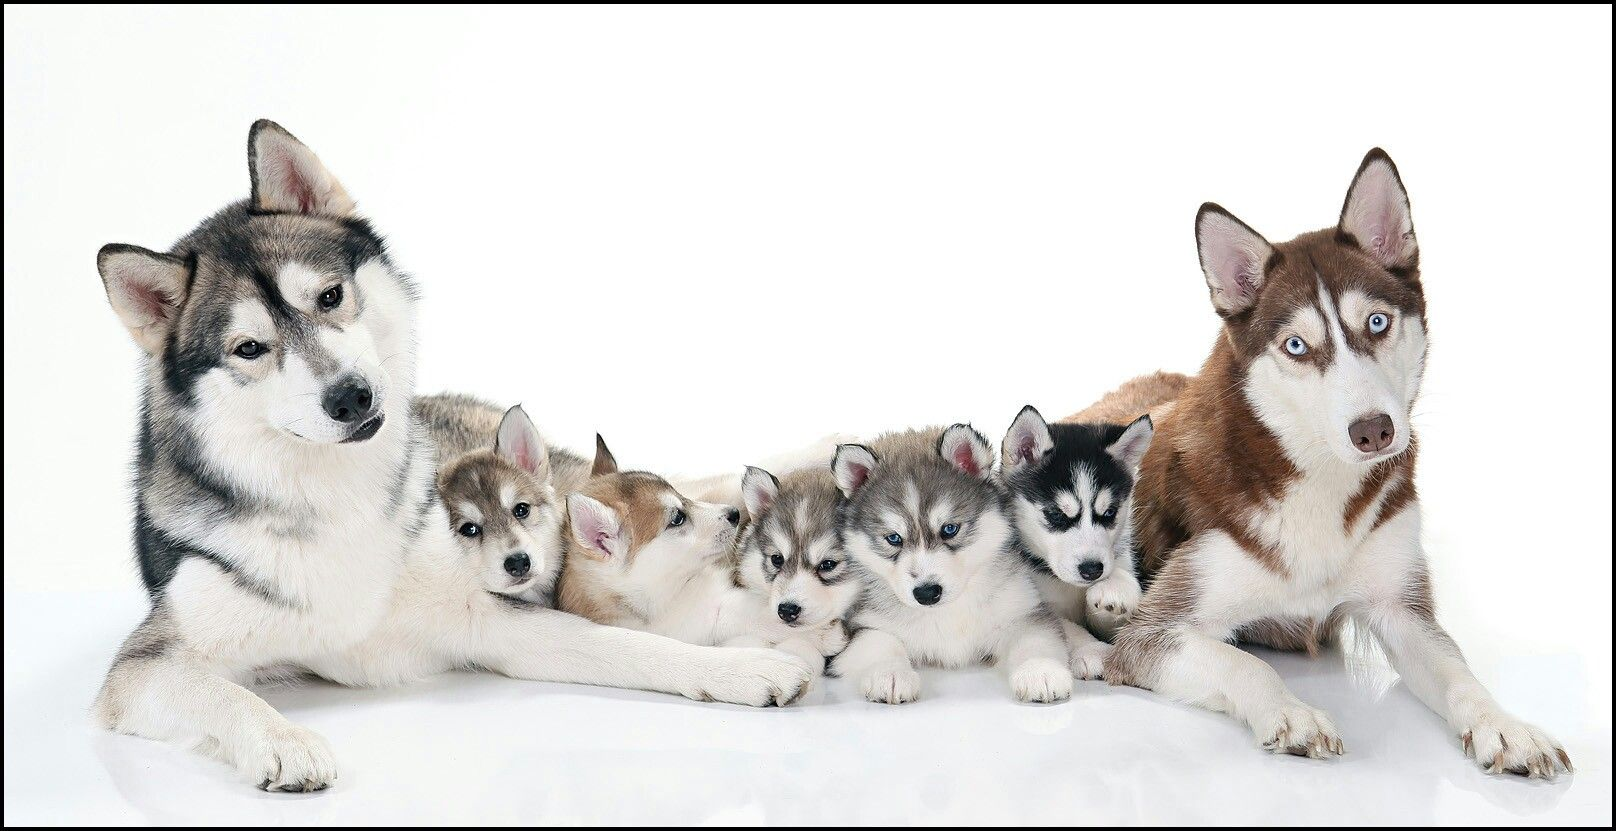 Husky Family Dog Lovers Siberian Husky Puppies